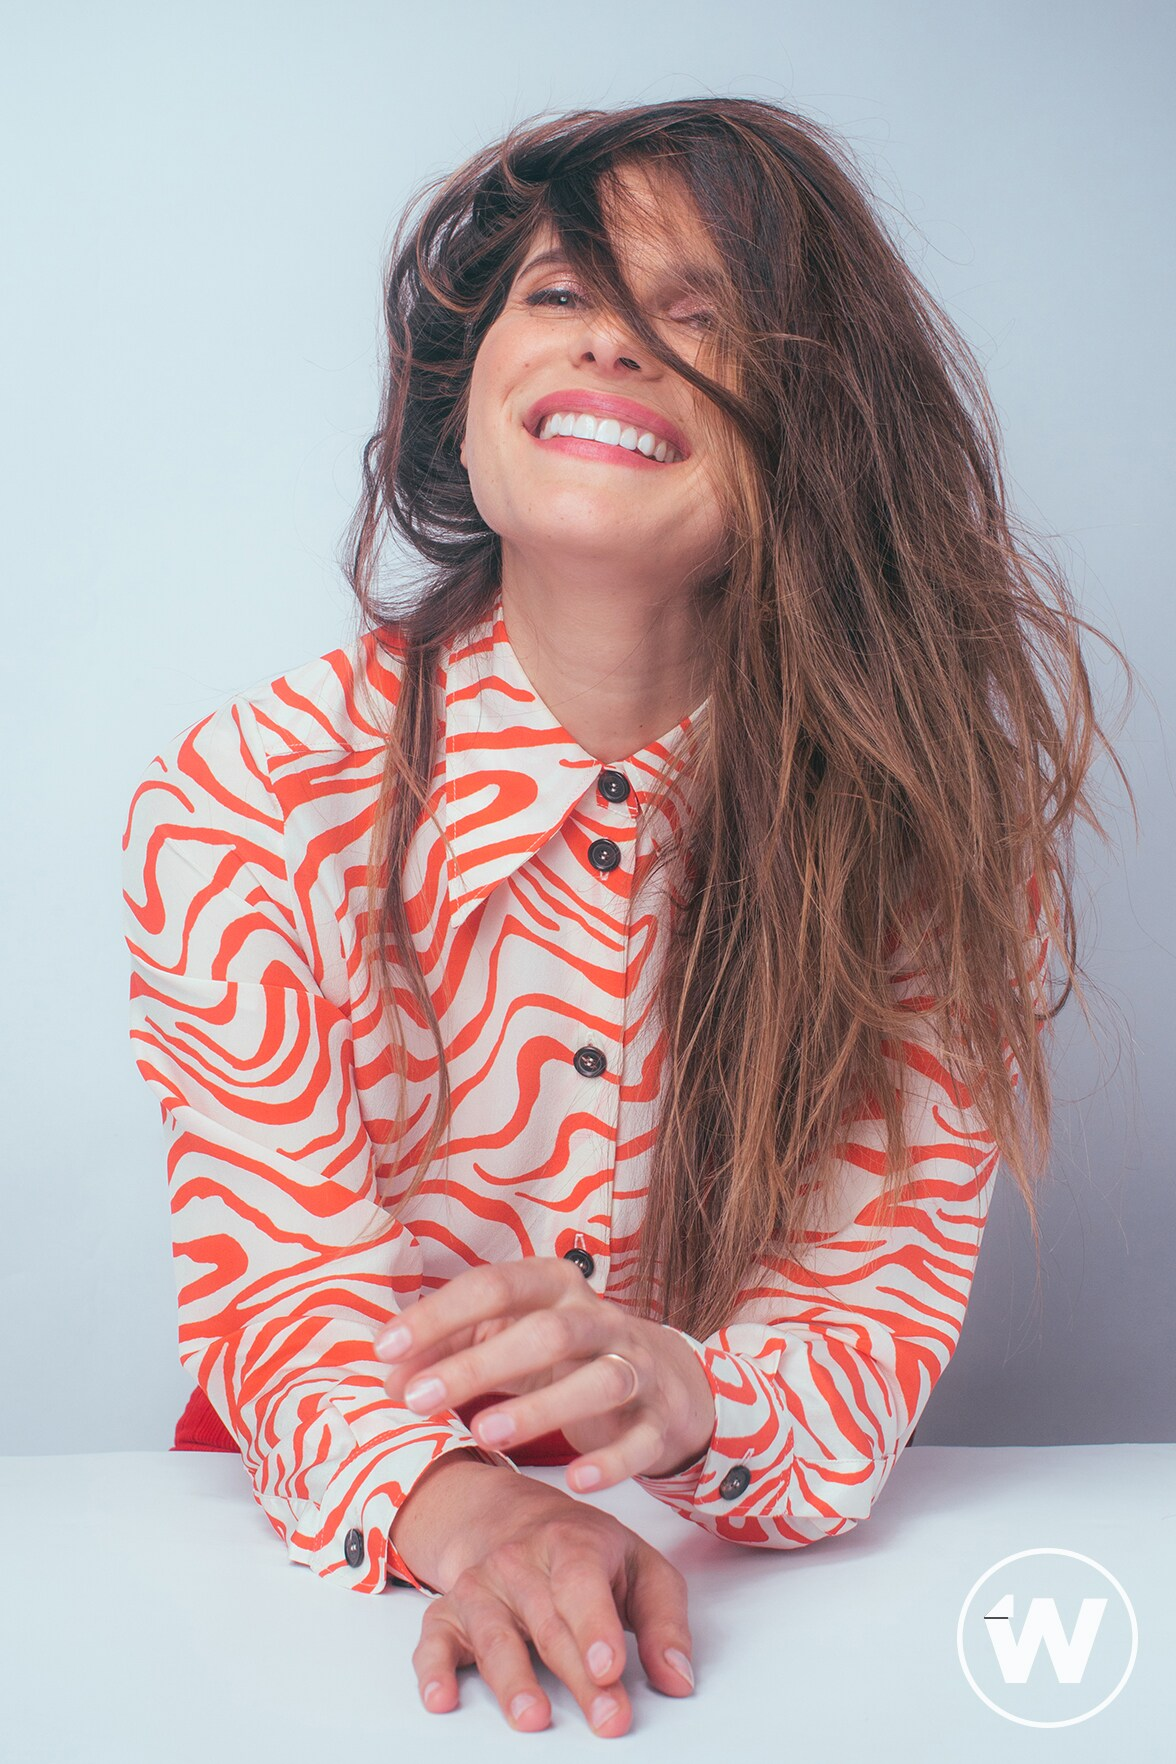 Tori Avano